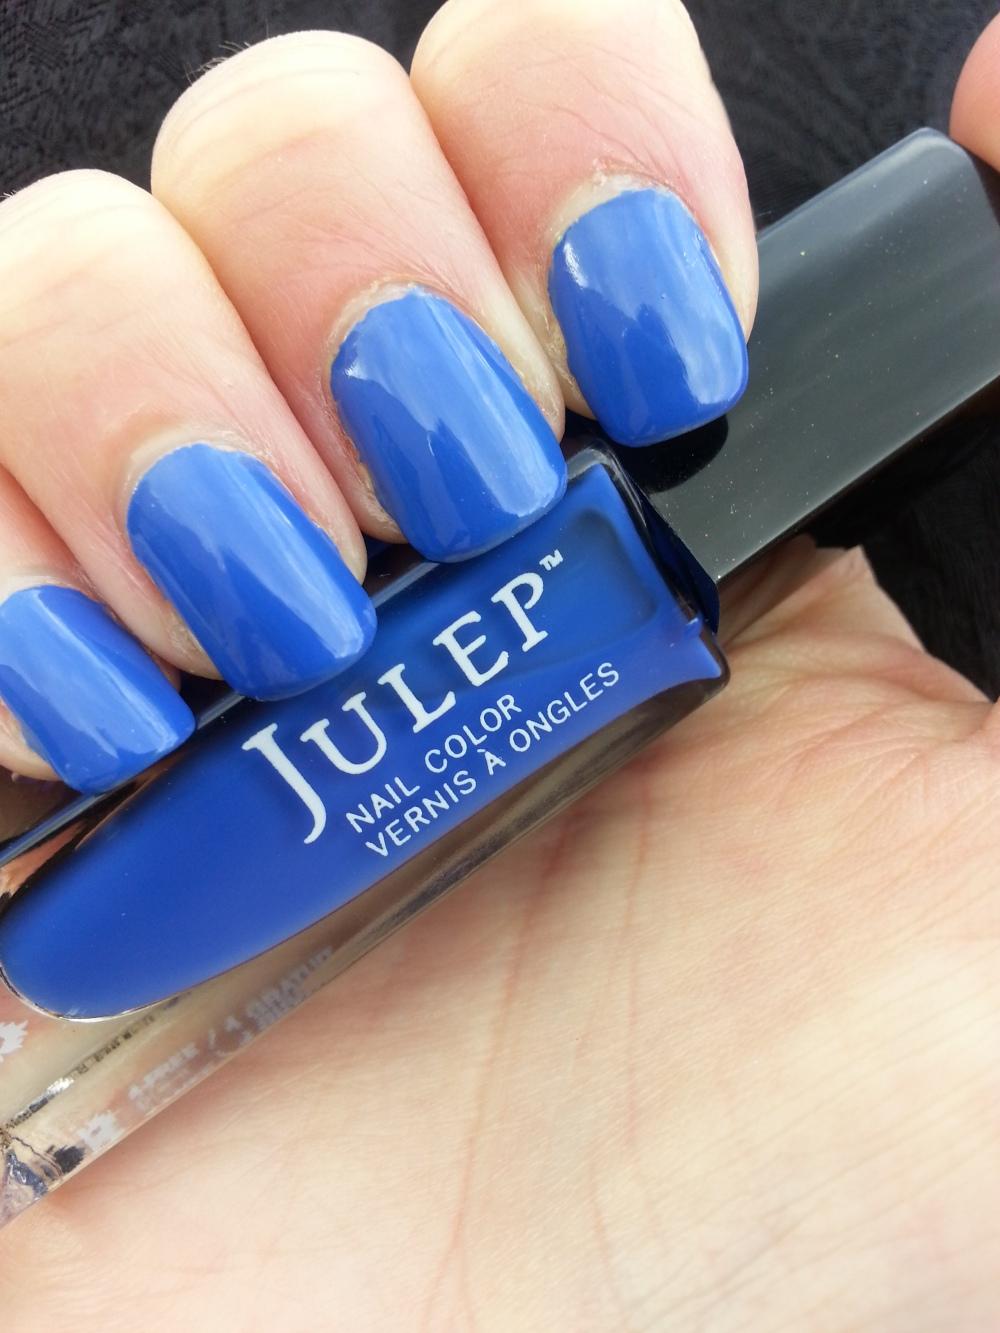 Dazzling Blue with Julep Monaco